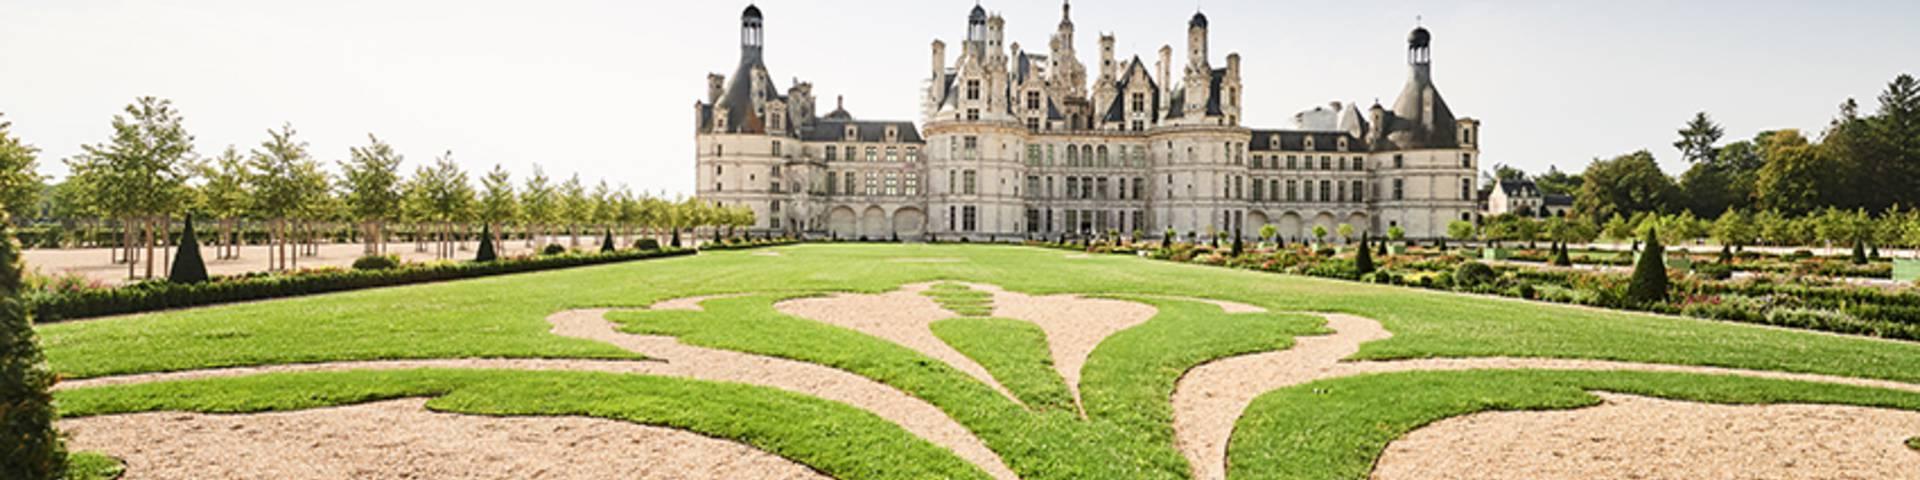 Chambord y sus jardines_© Benjamin Brolet